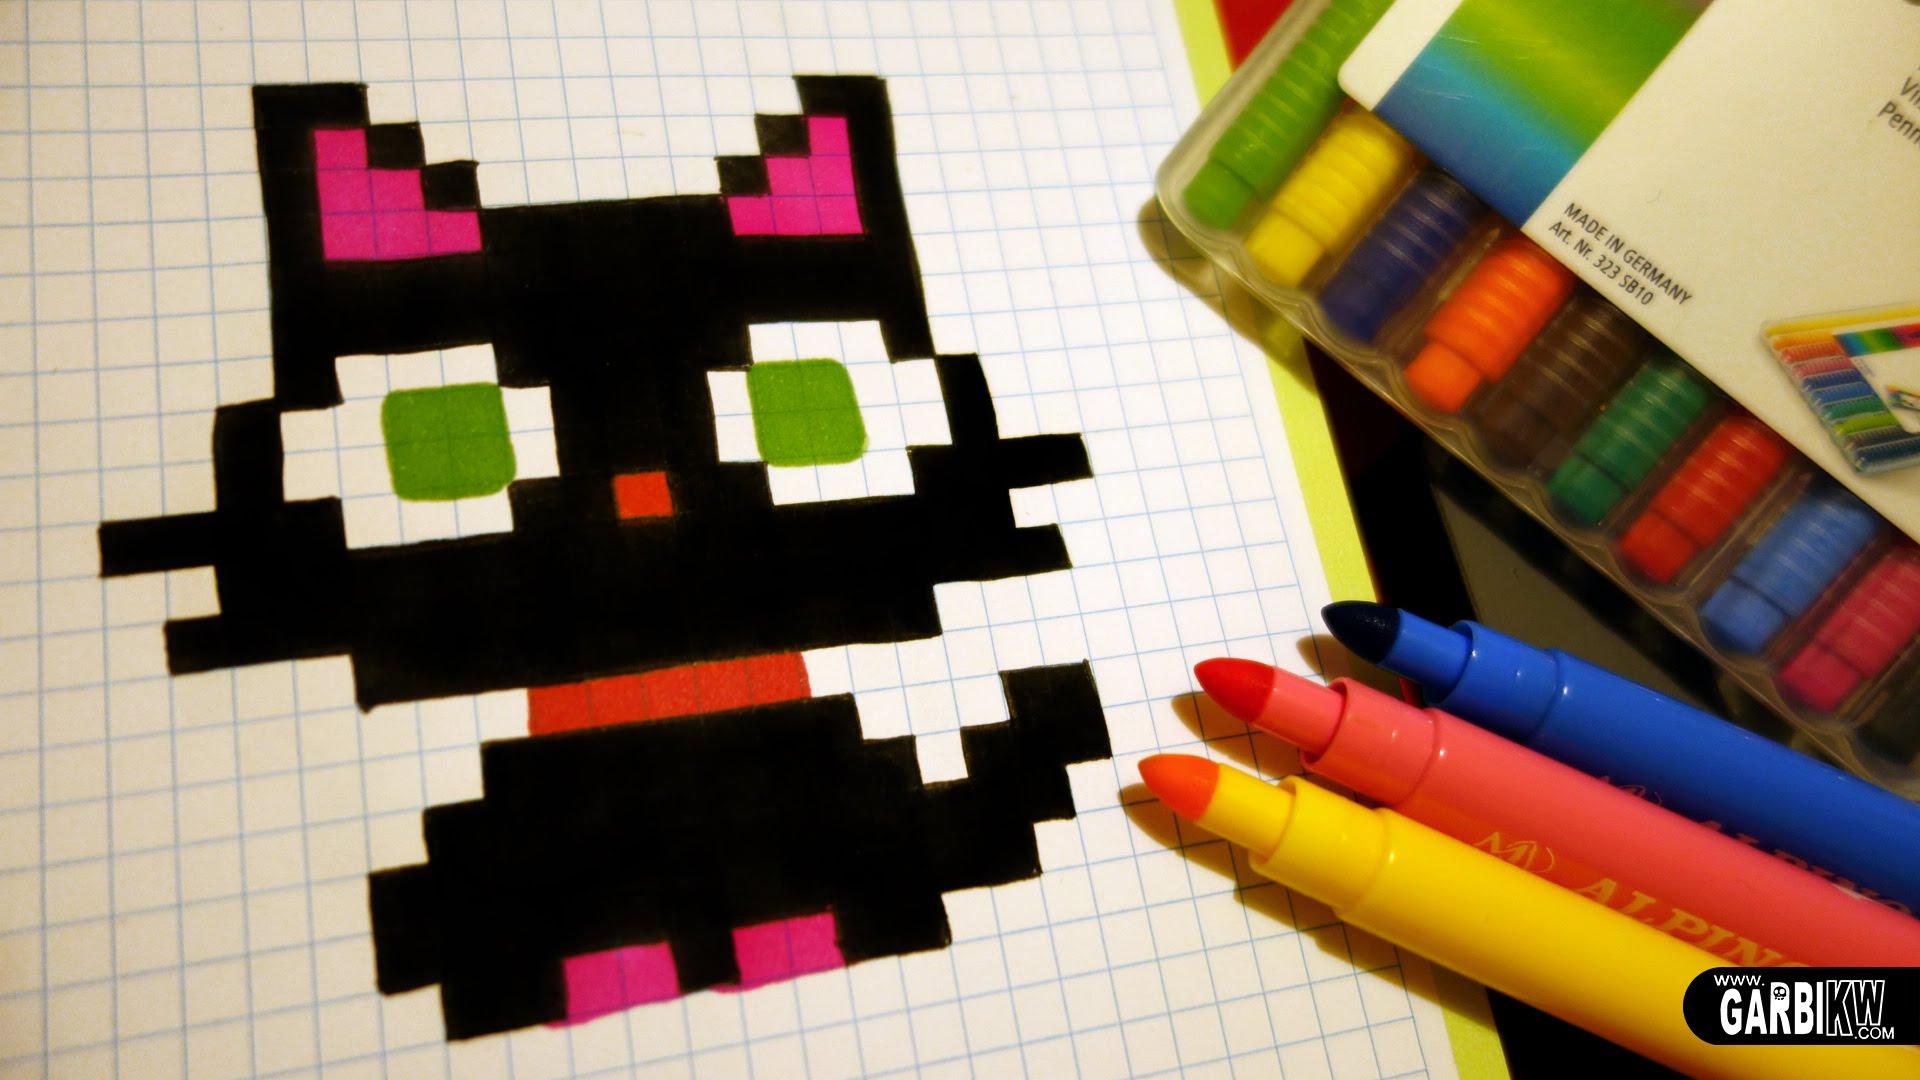 Drawn pixel art poxel Pixel Art a Handmade How